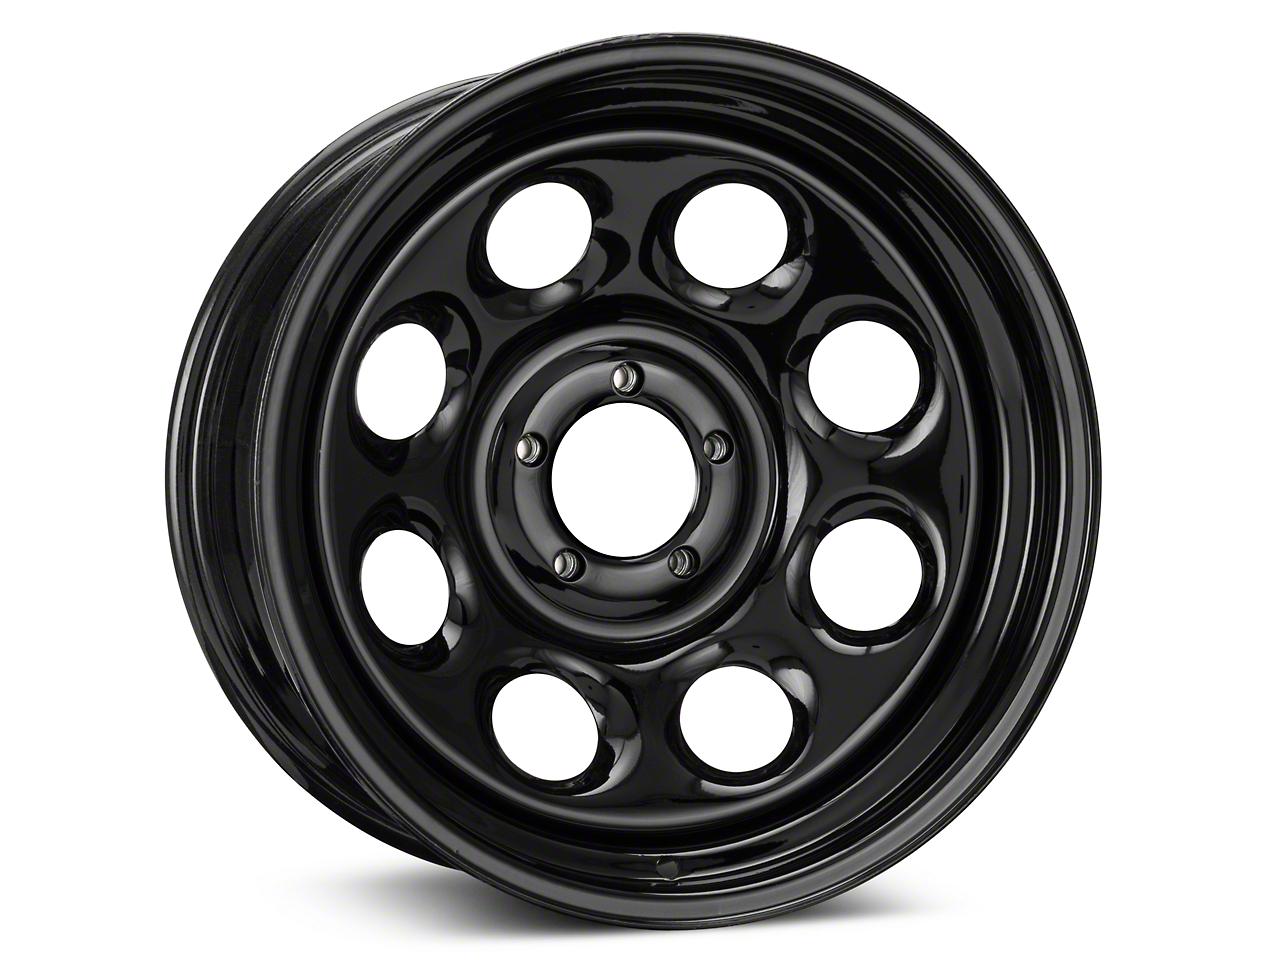 Pro Comp Steel Series 98 Rock Crawler Gloss Black Wheel - 17x8 (87-06 Wrangler YJ & TJ)